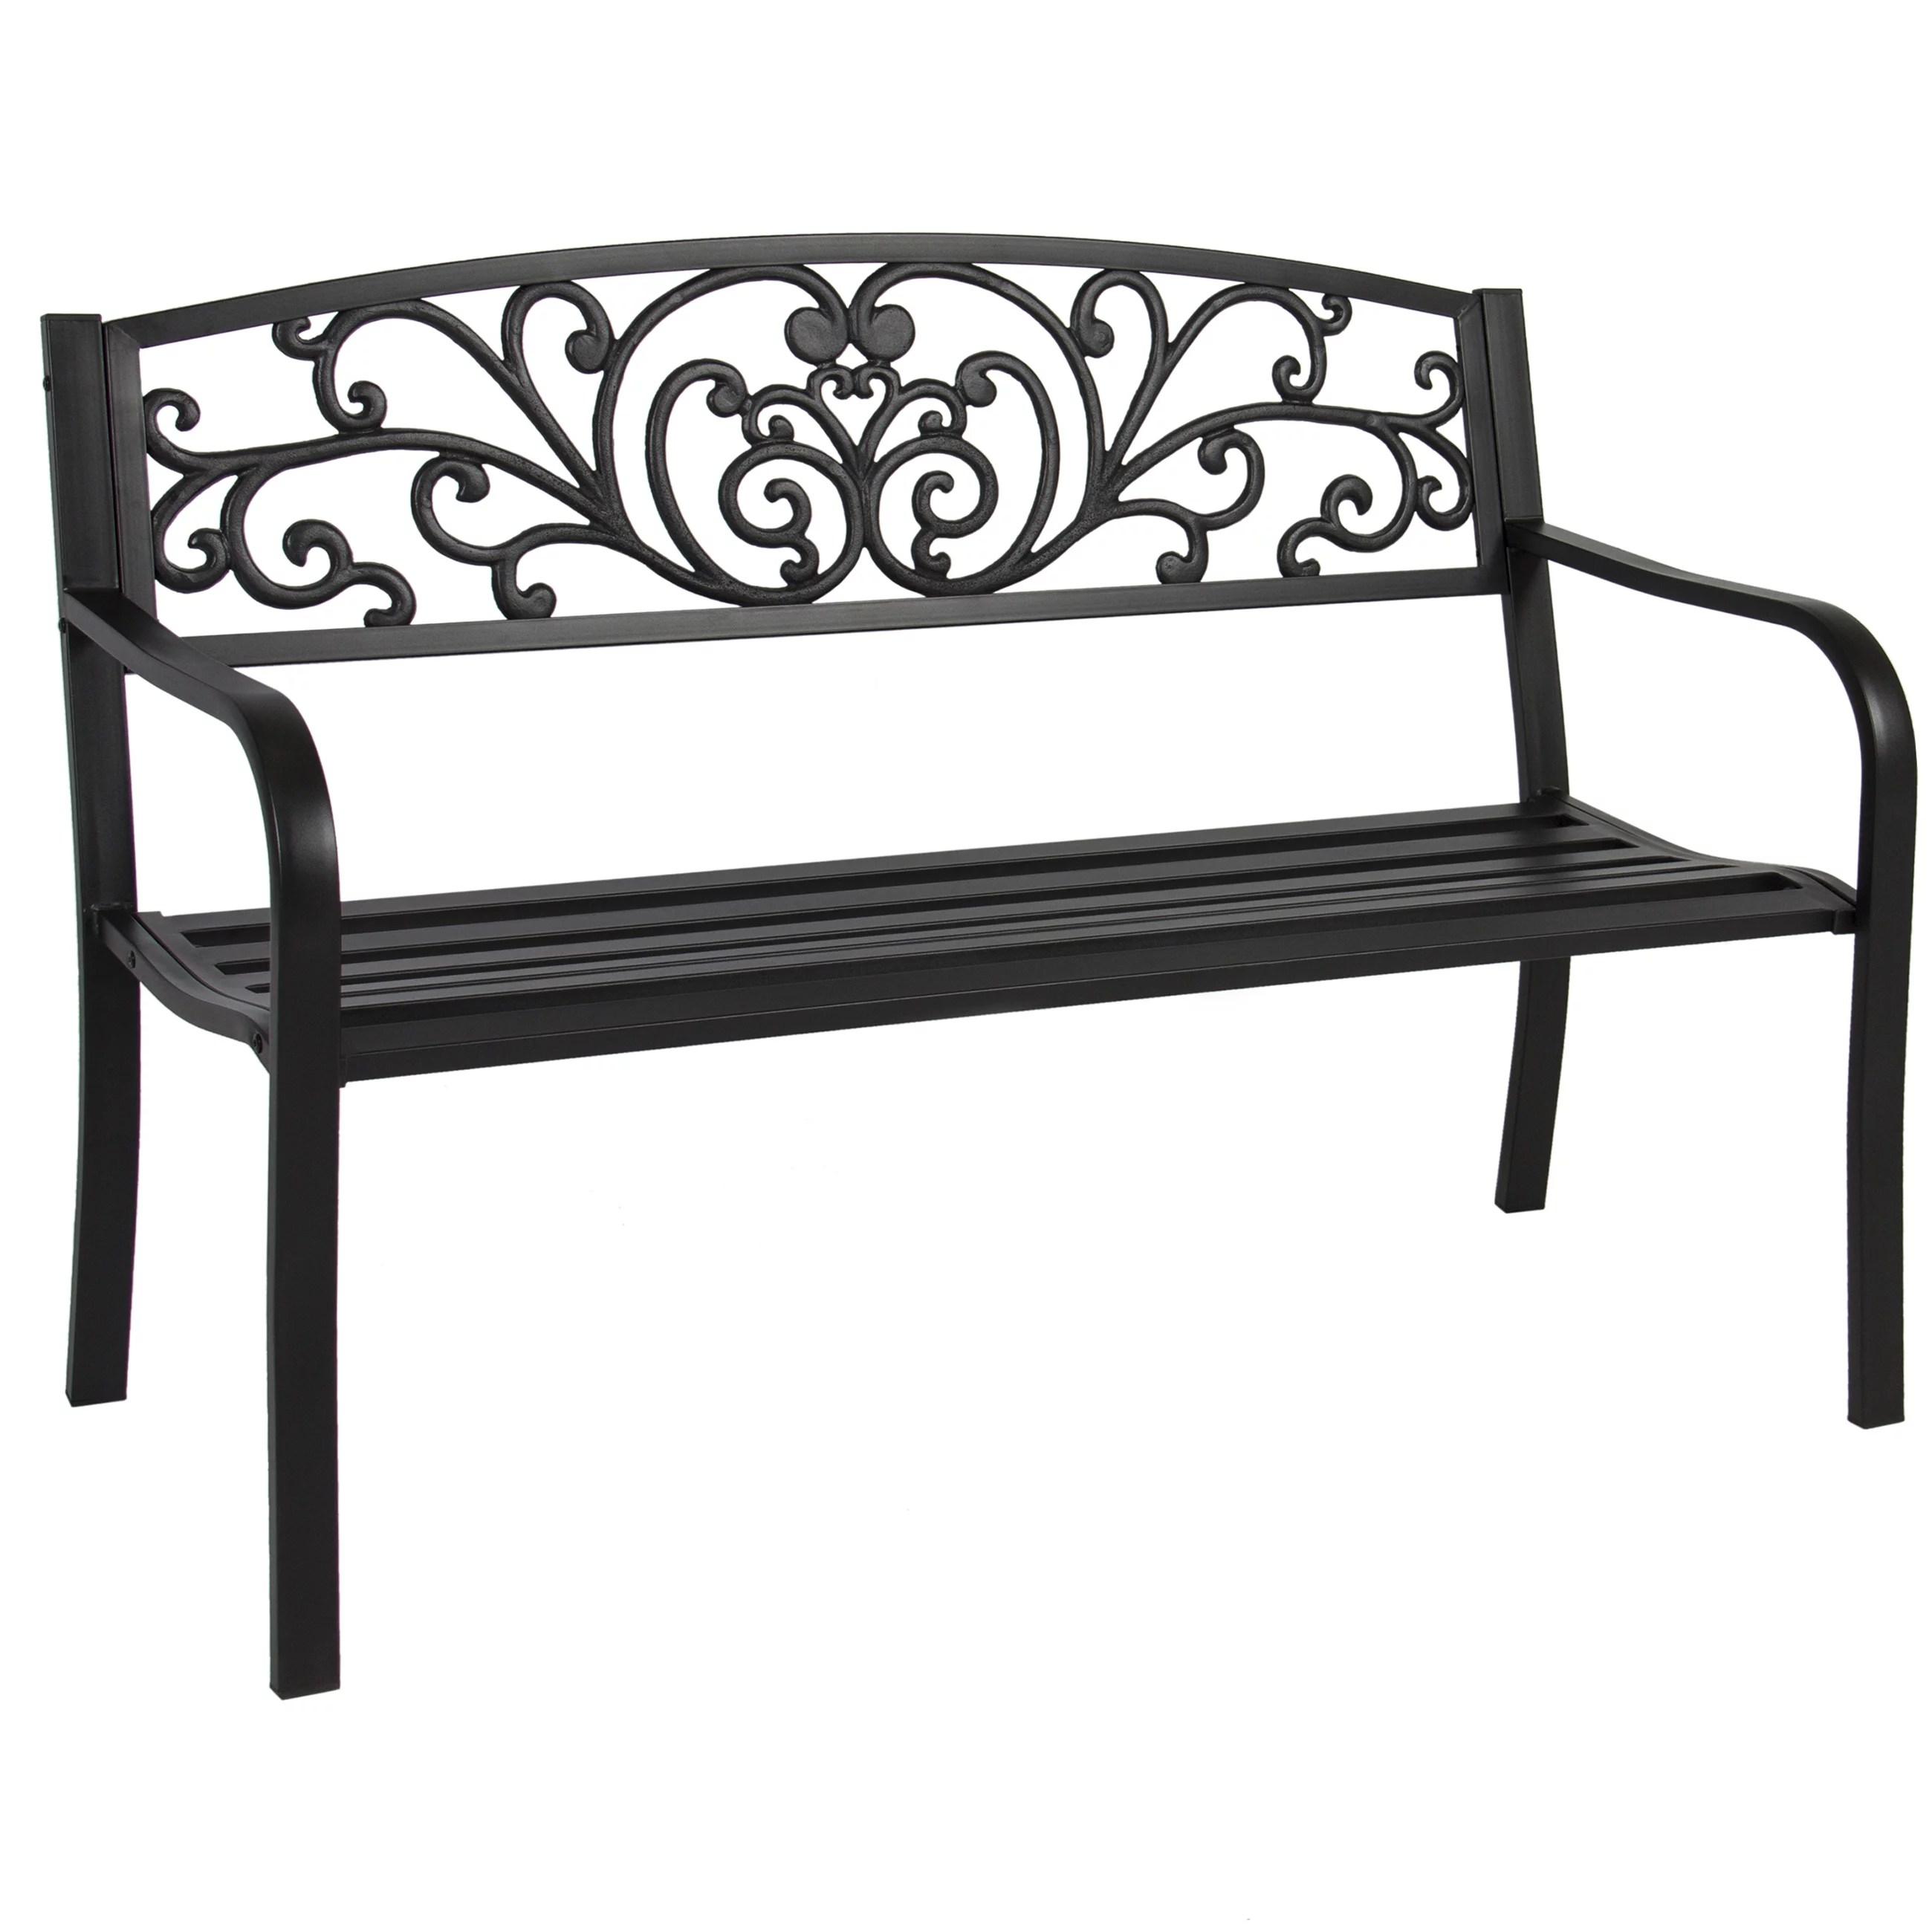 Best Choice Products 50in Outdoor Patio Garden Bench Park Yard Furniture Porch Chair W Steel Frame Black Walmart Com Walmart Com